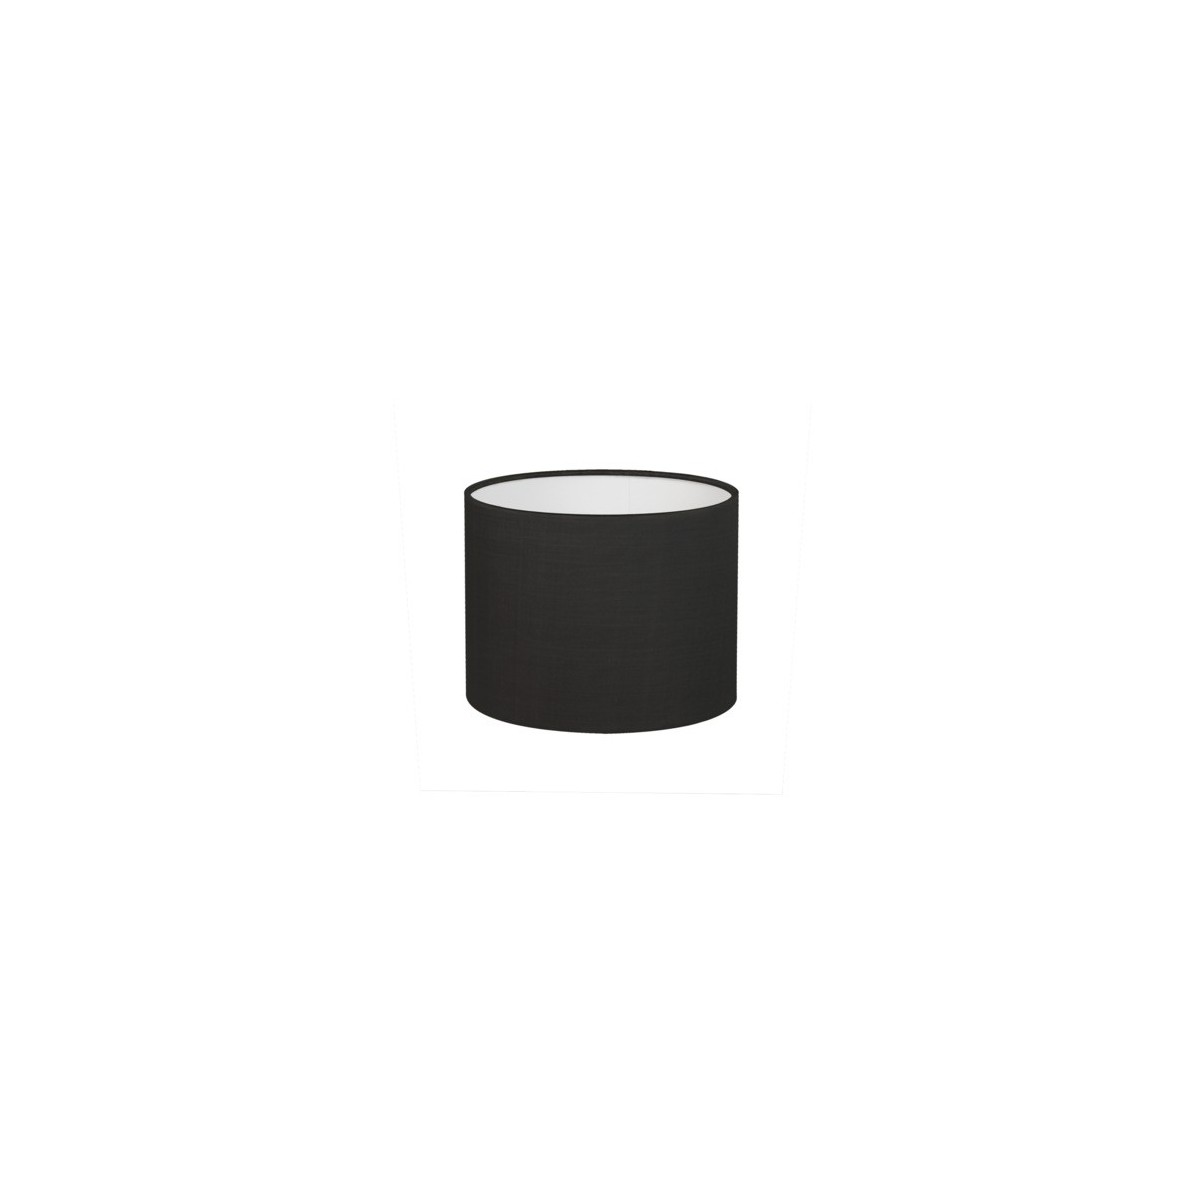 Astro Drum 150 Abażur Czarny 5016002